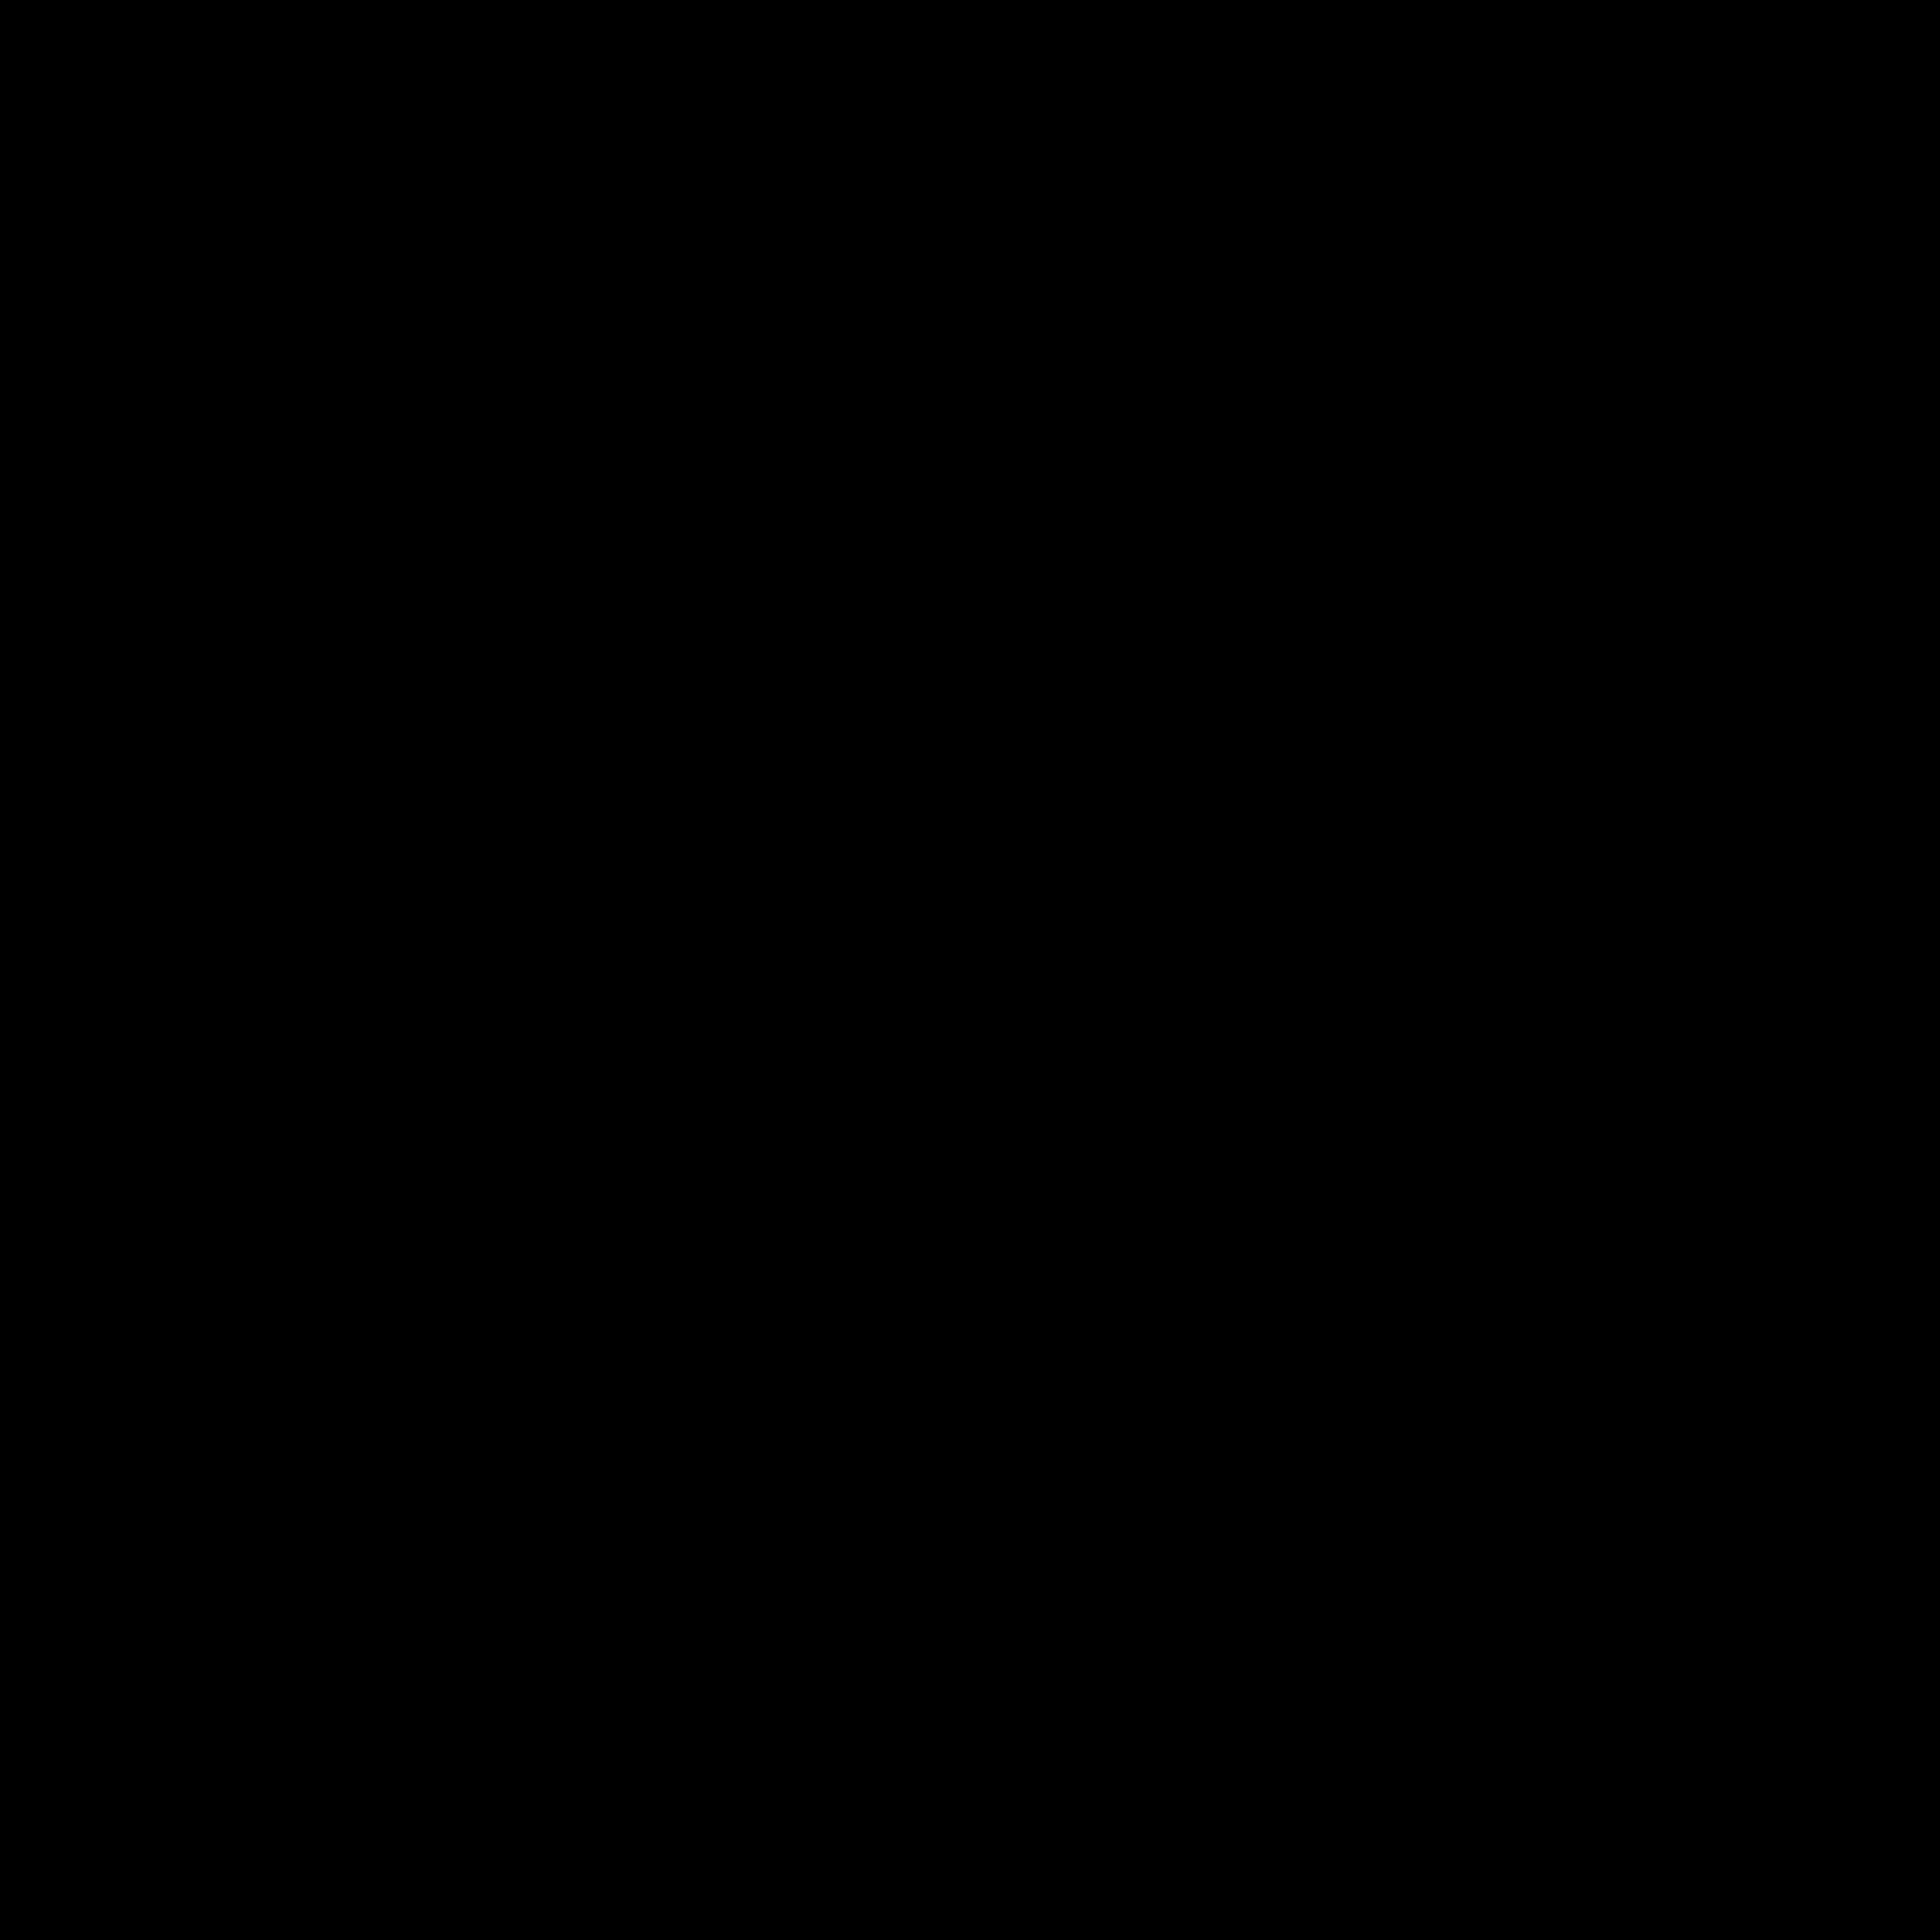 Geini-Tee